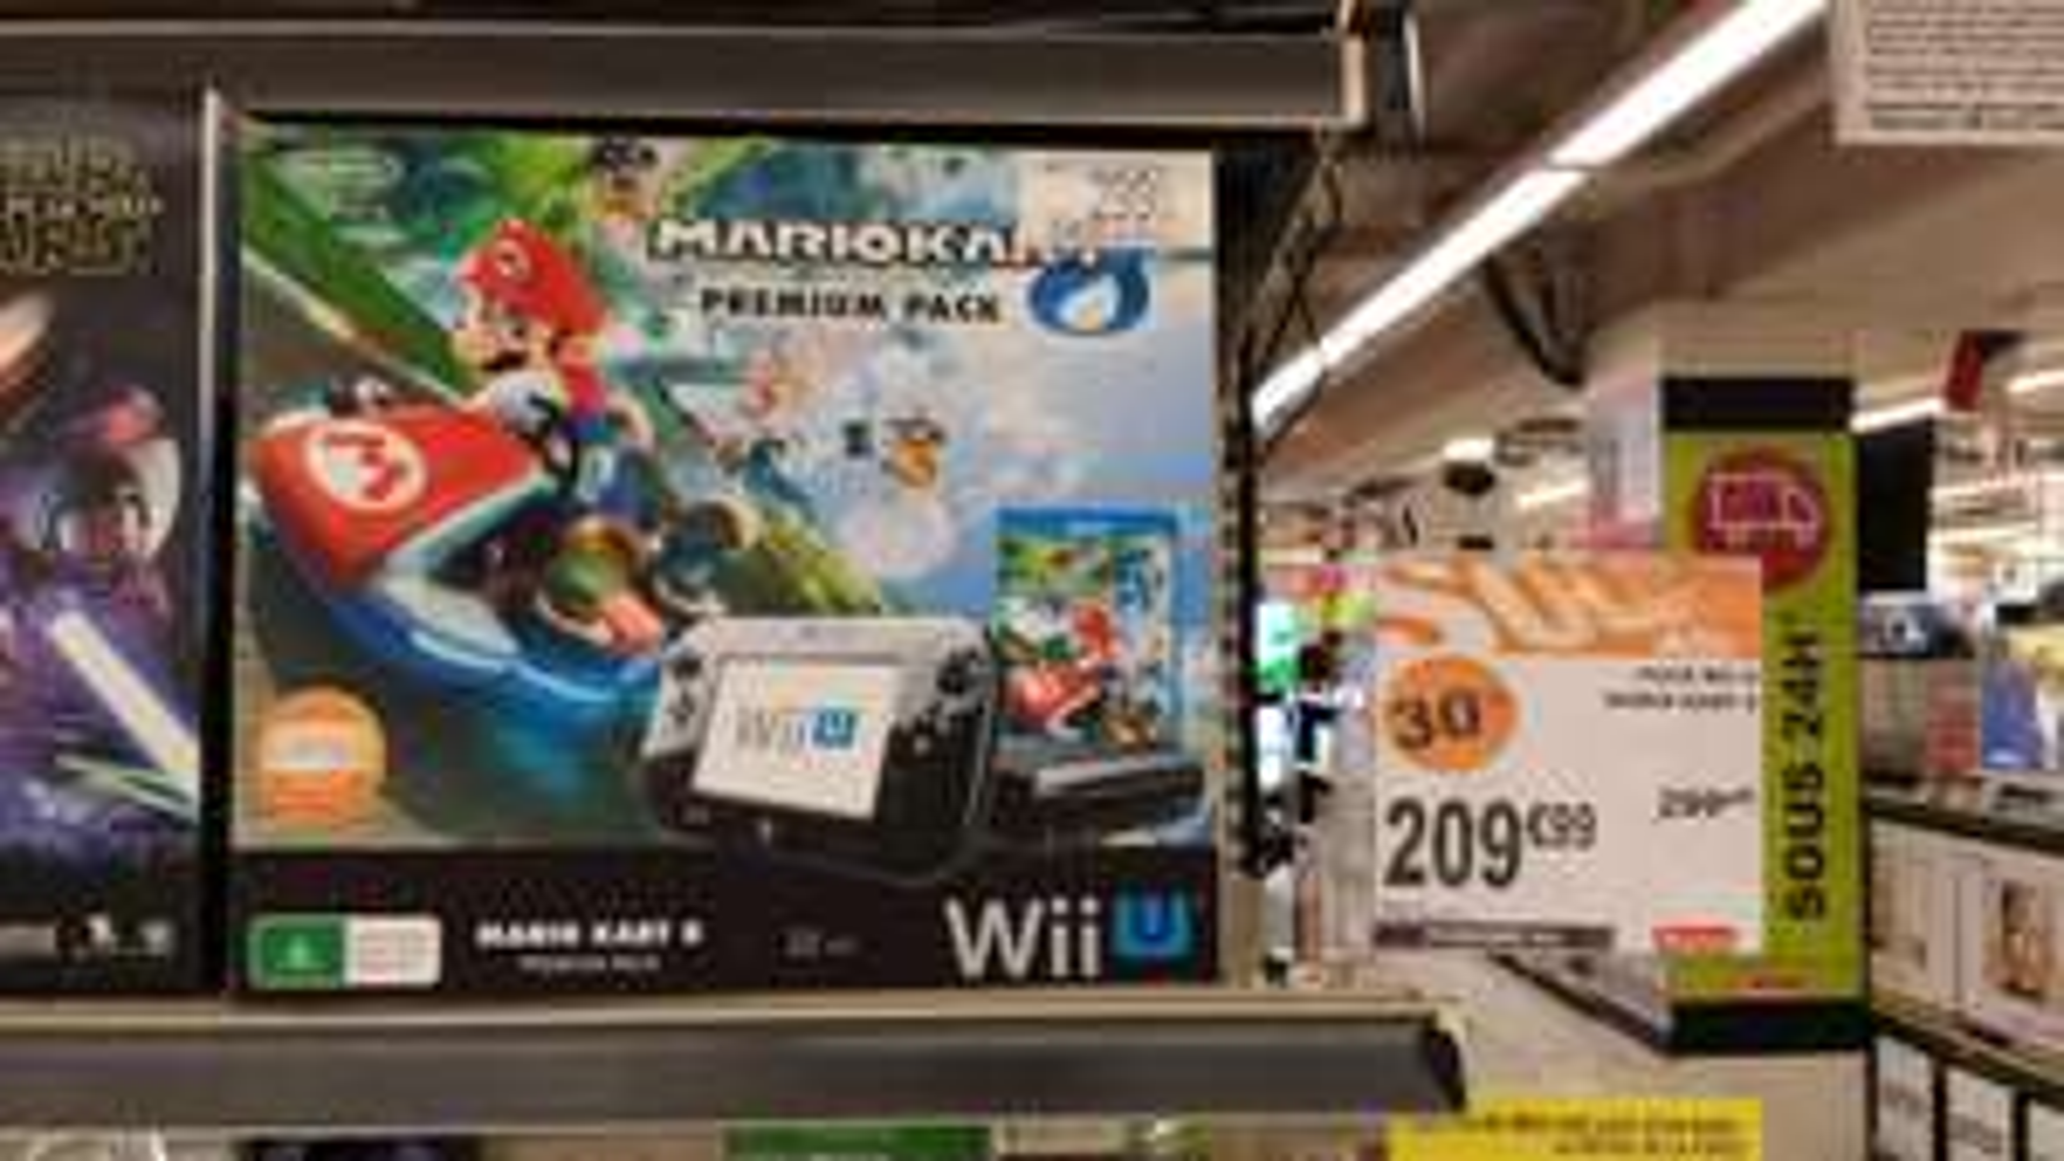 Console Wii U 32Go + Mariokart 8 Premium Pack